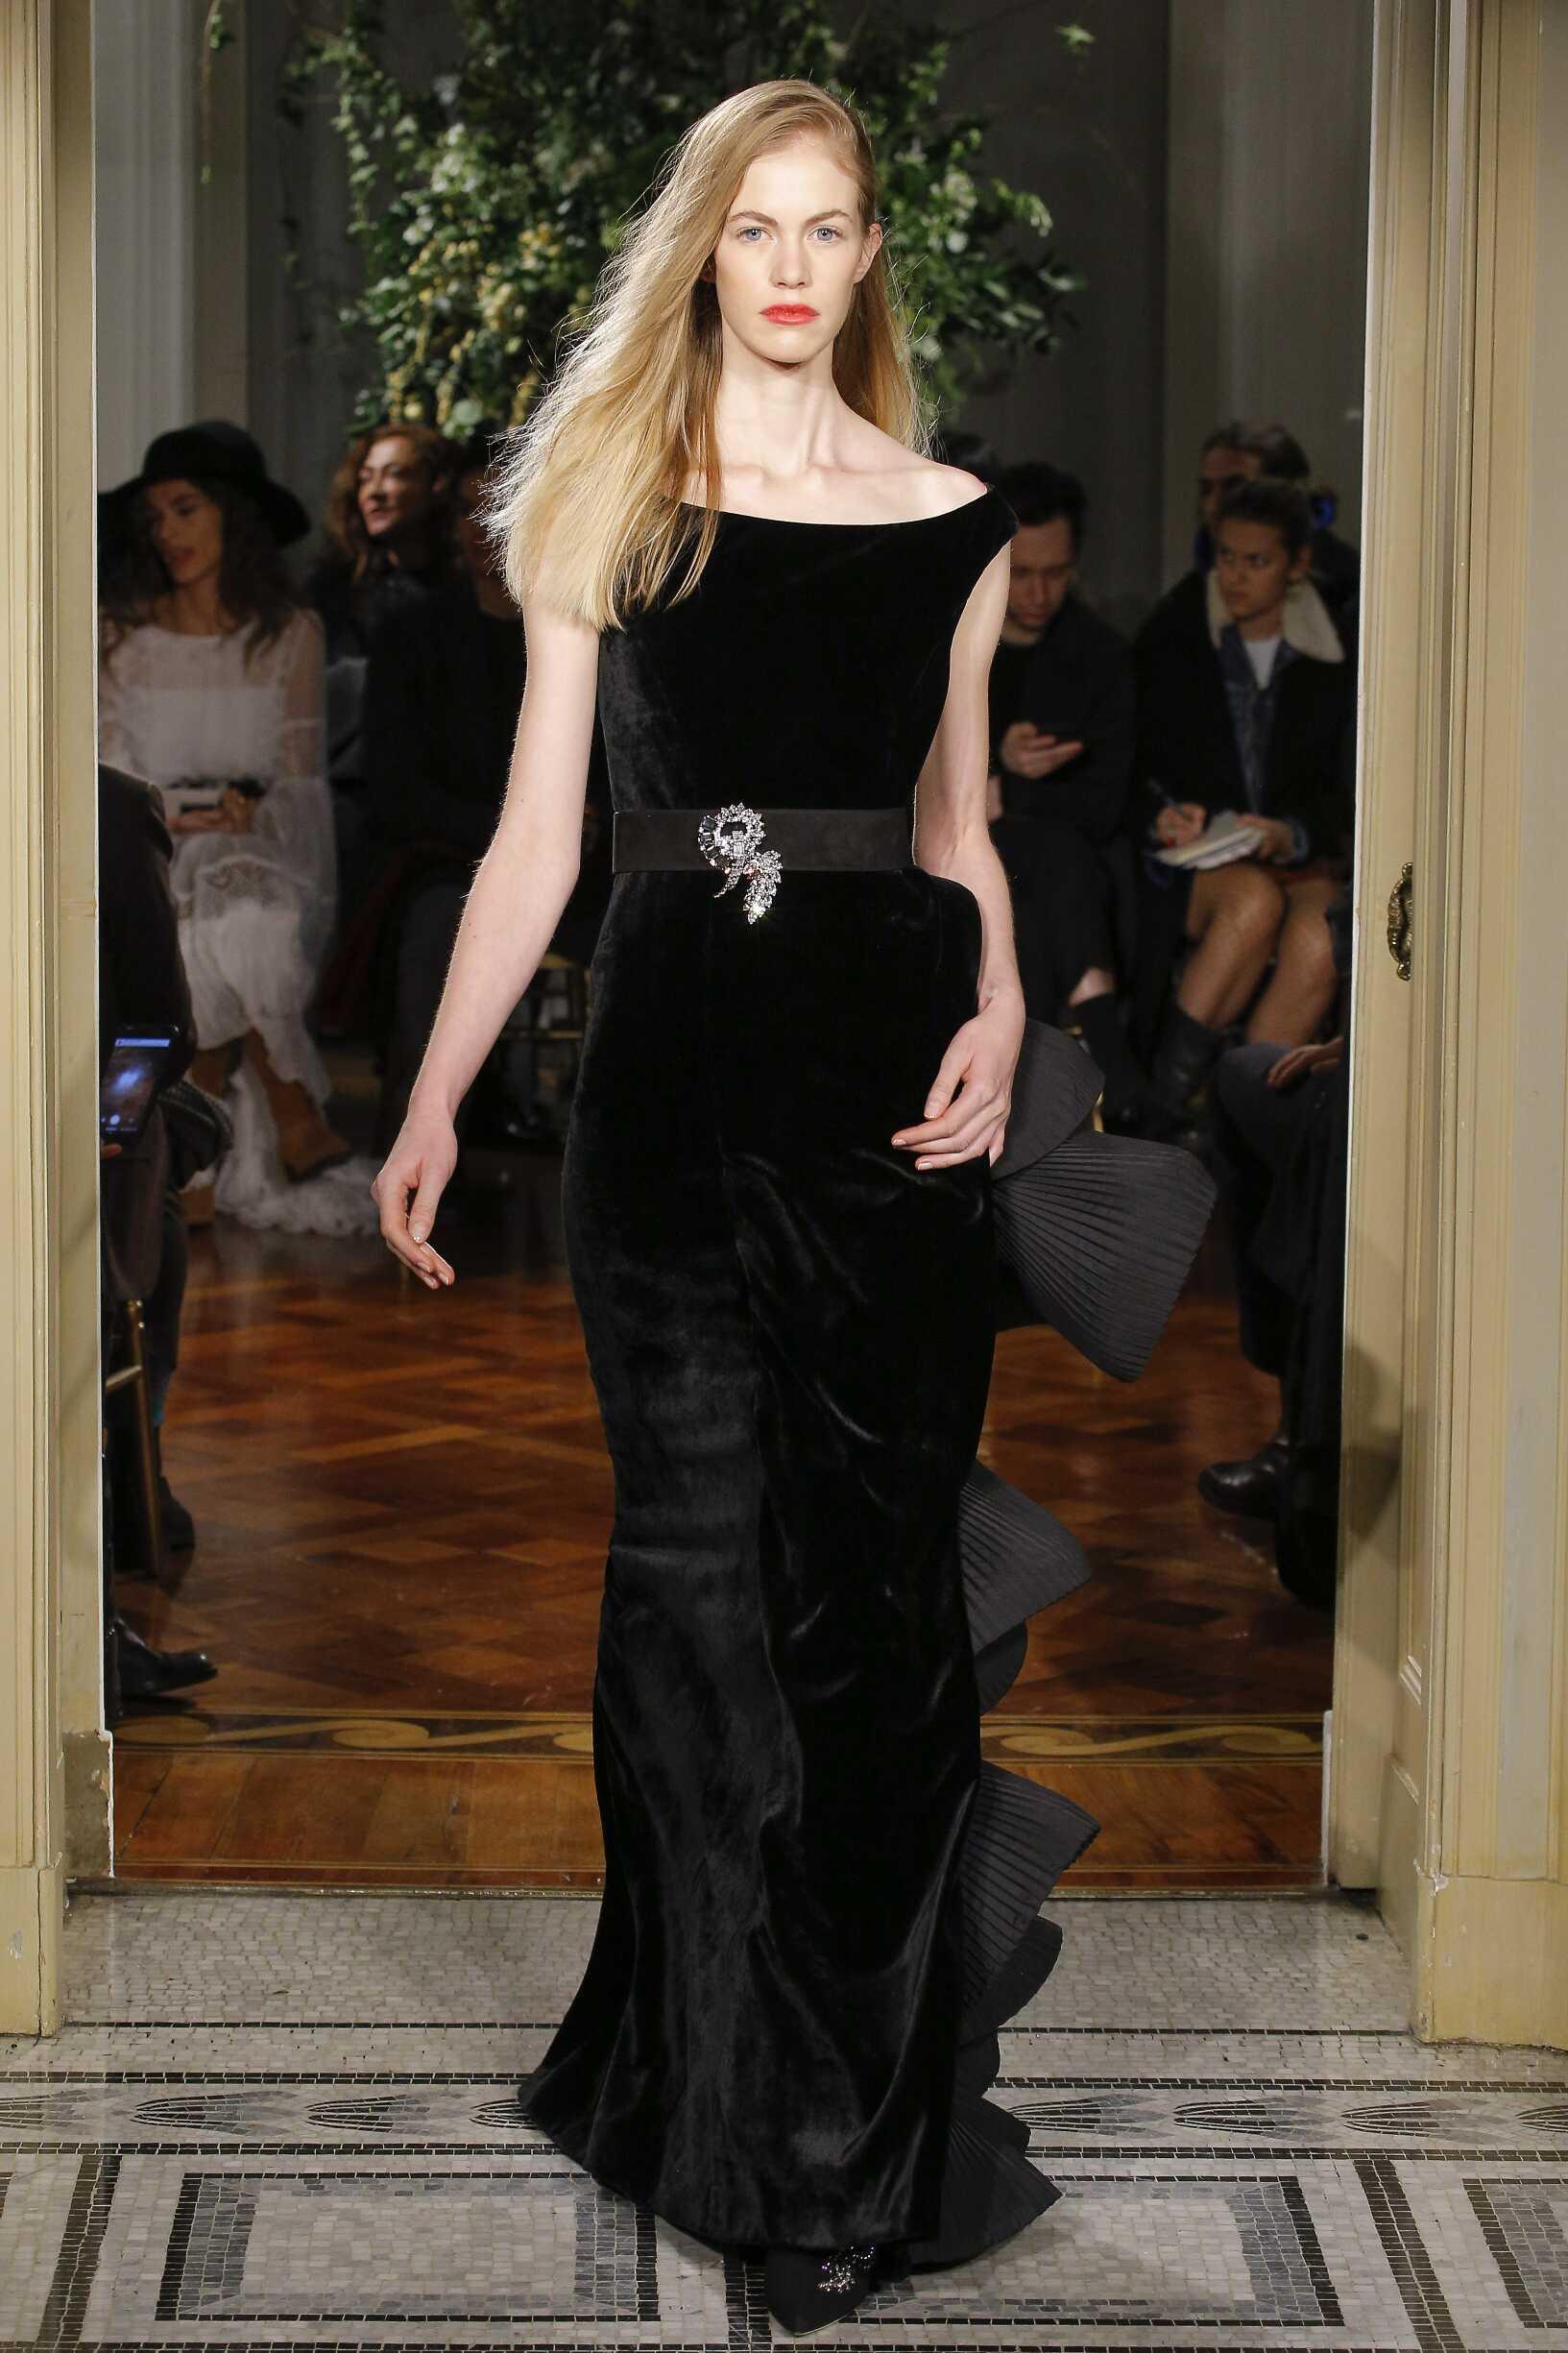 Alberta Ferretti Limited Edition Woman Catwalk